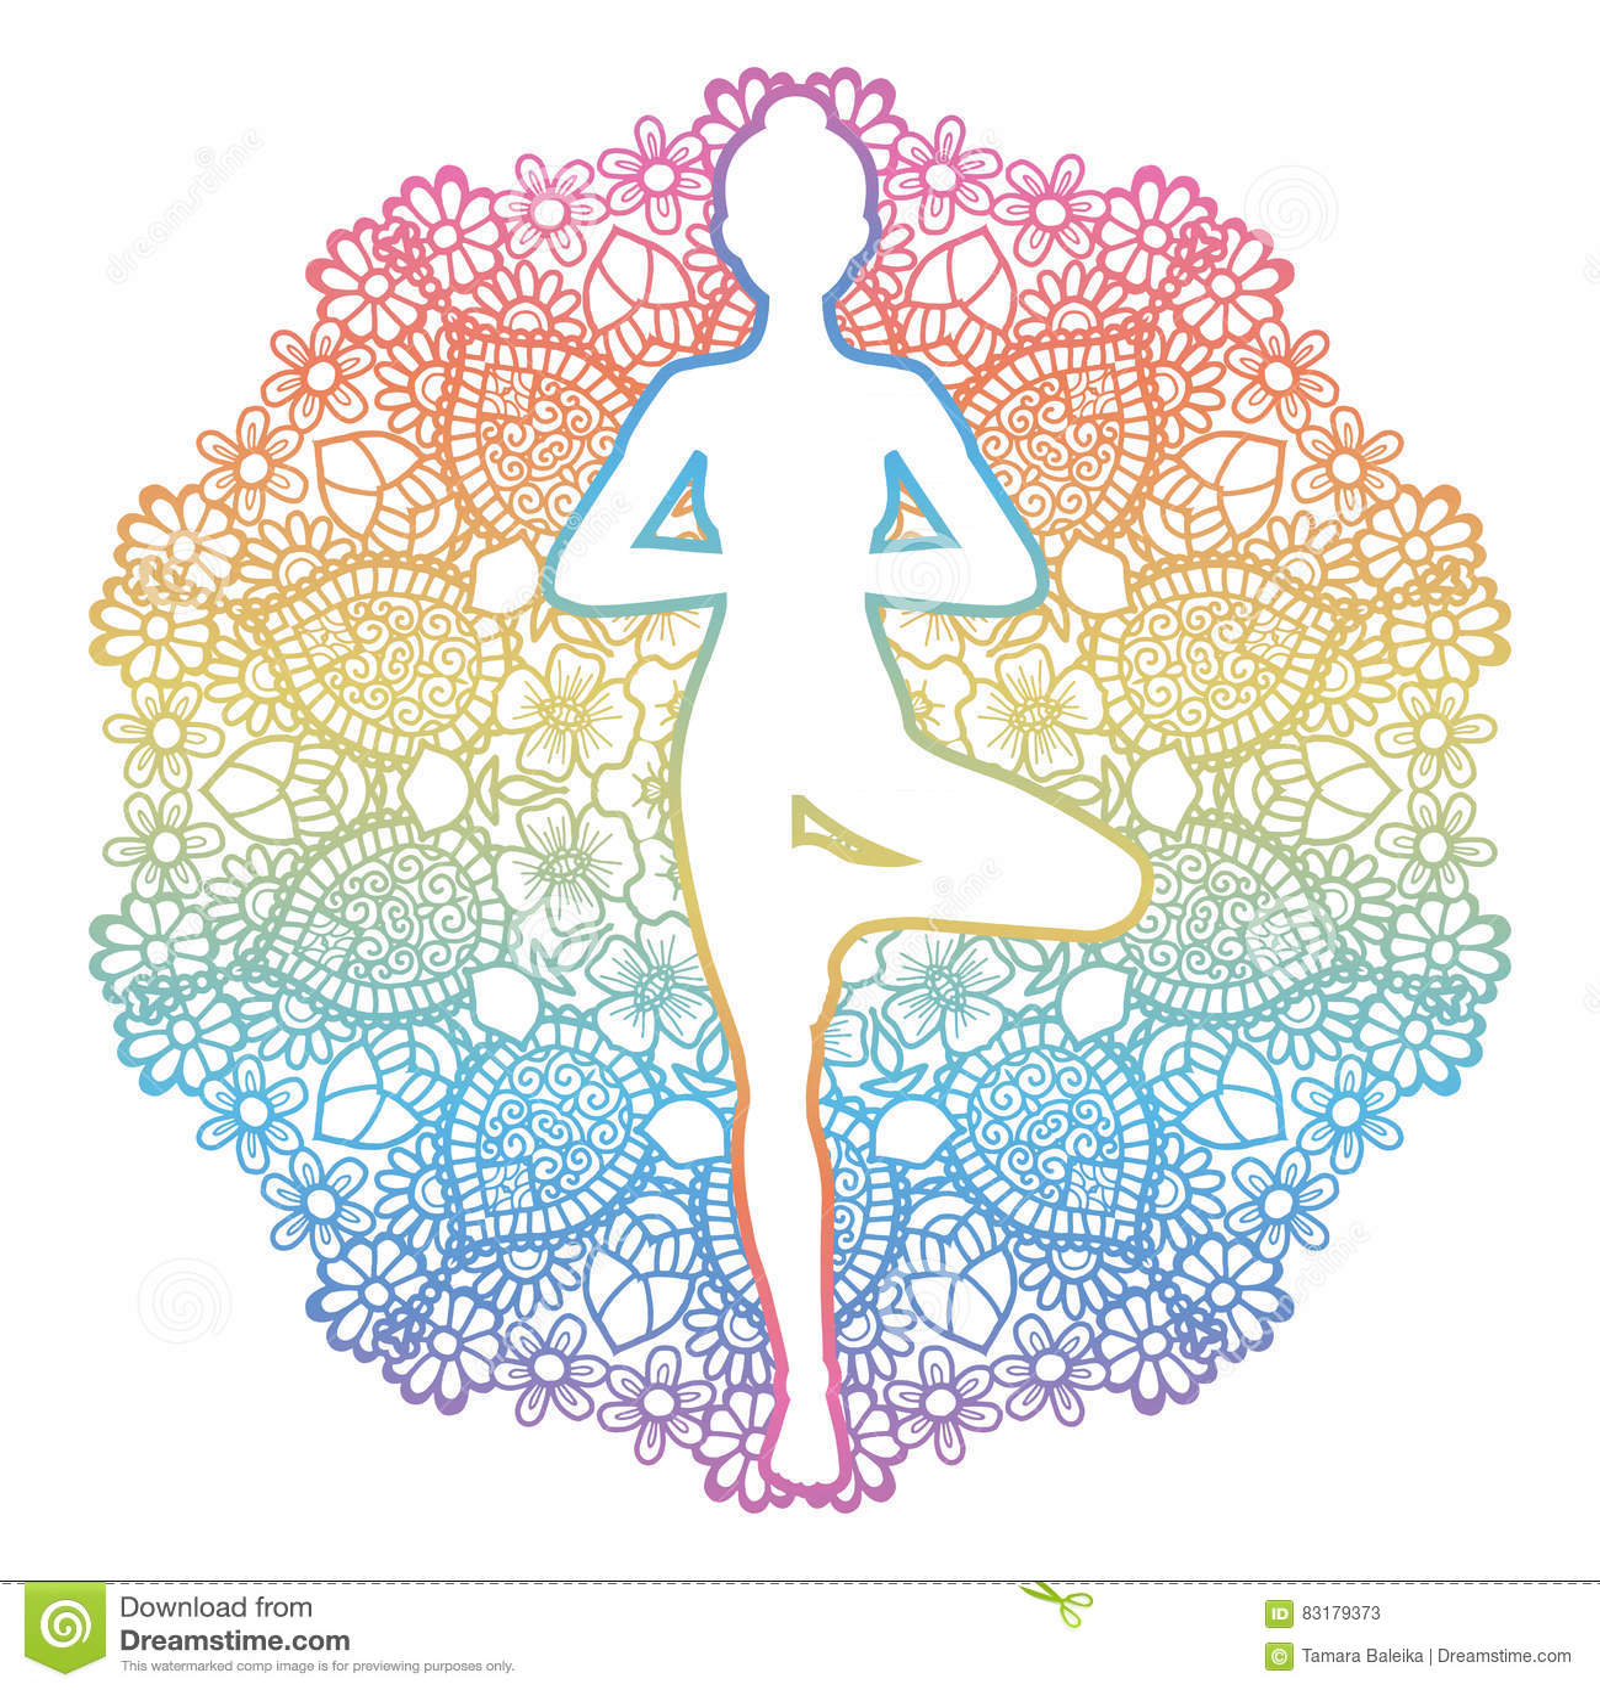 Yoga tree pose silhouette